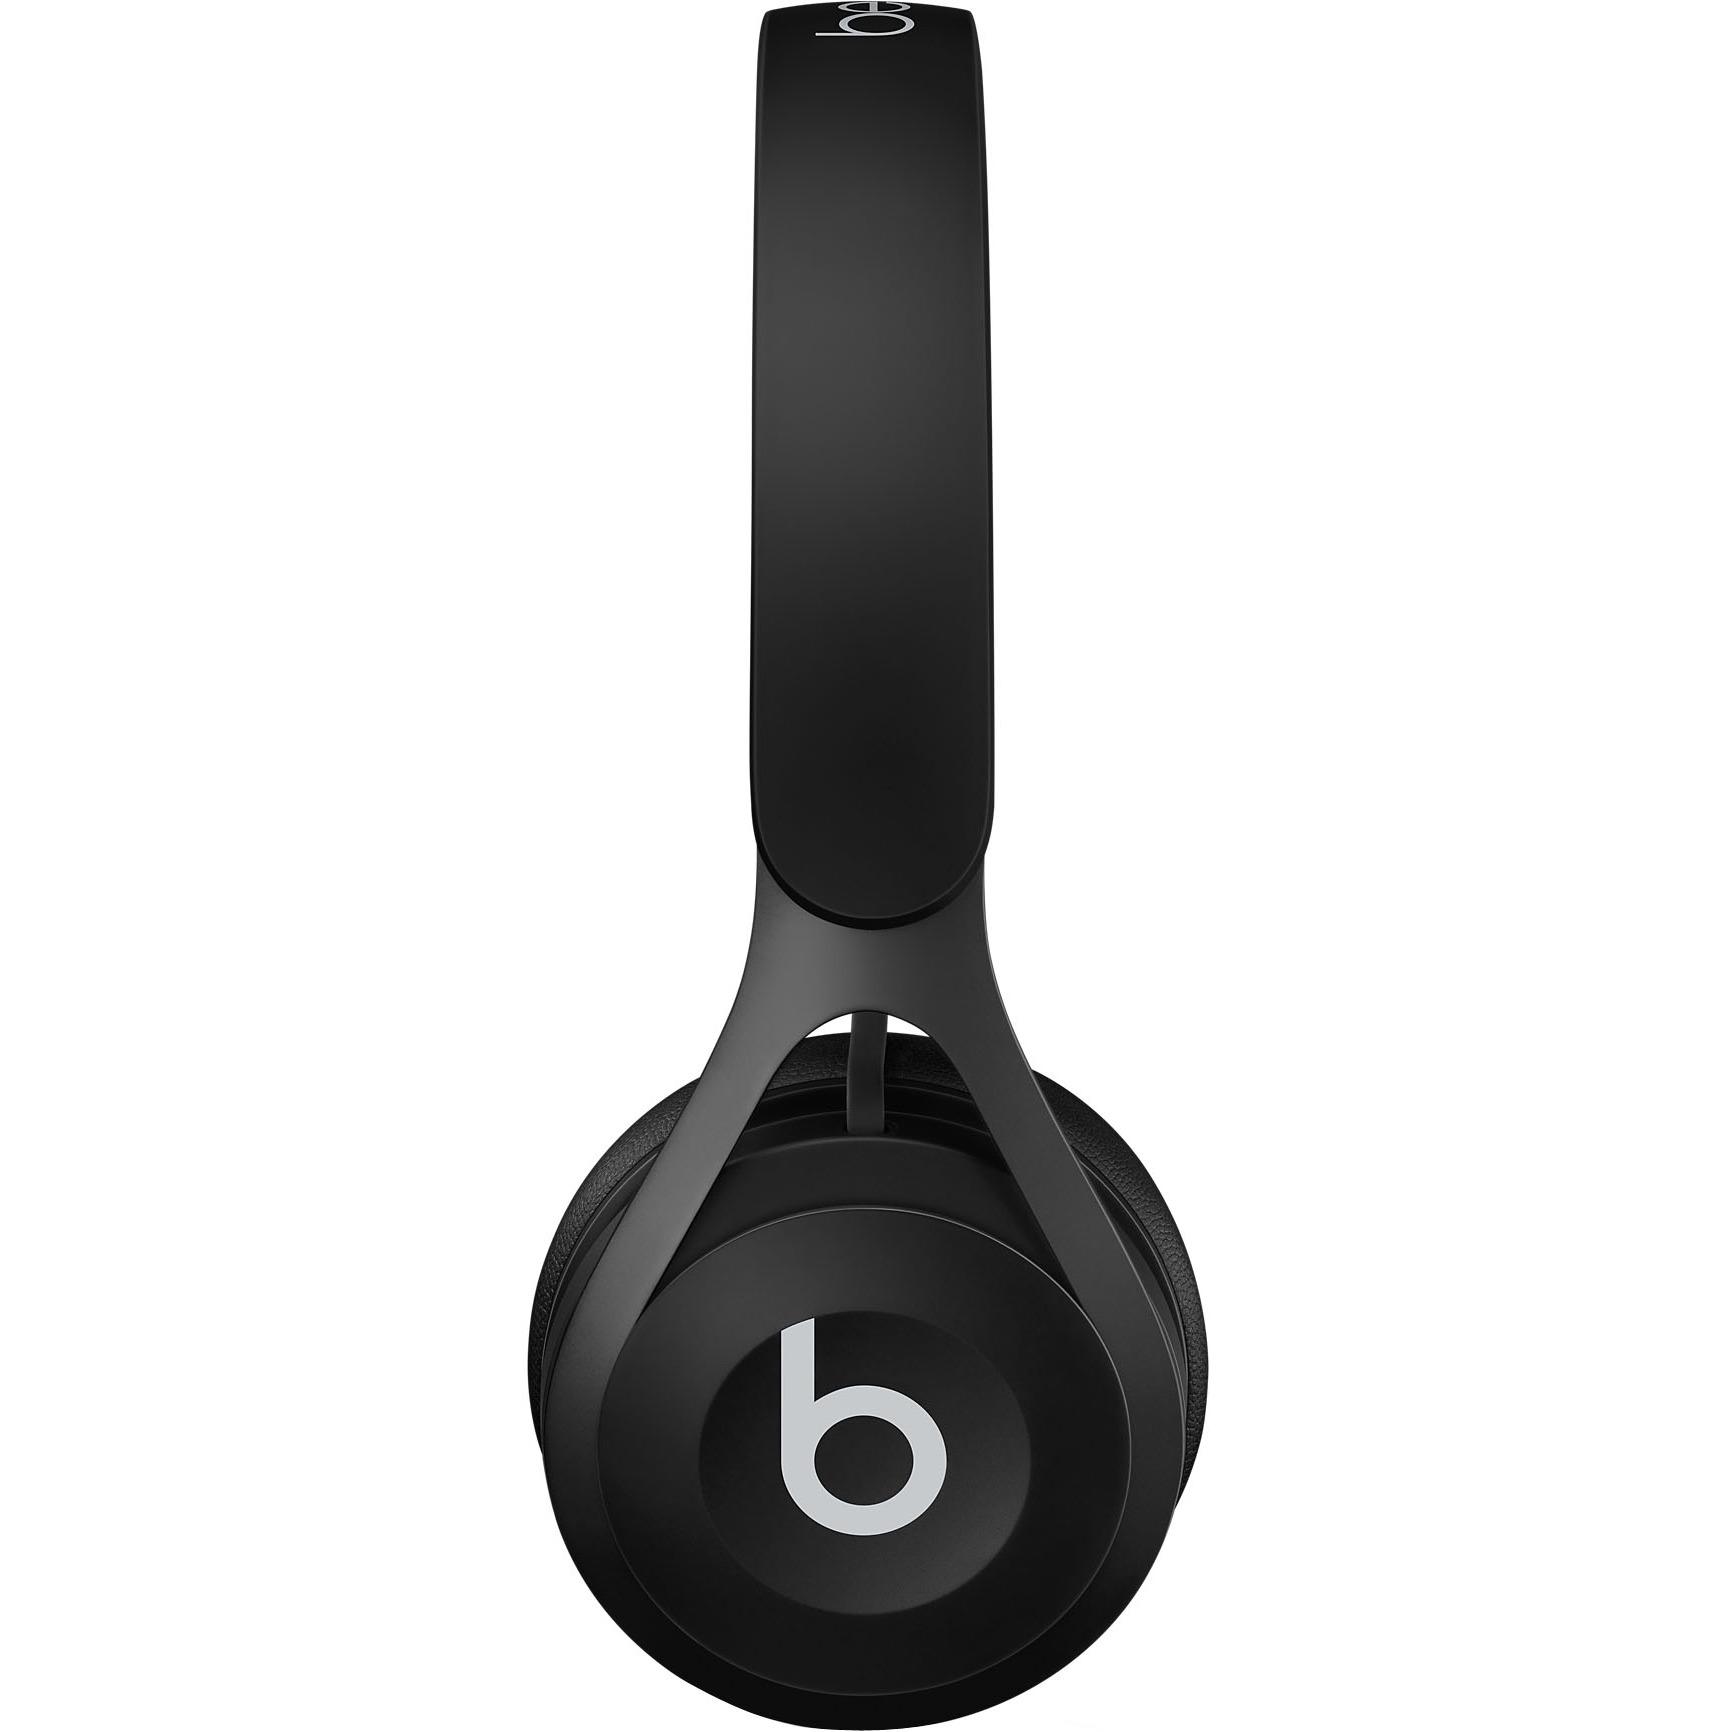 Beats by Dr. Dre EP On-Ear Headphones - Black - Stereo - Black - Mini-phone - Wired - Over-the-head - Binaural - Supra-aural 2